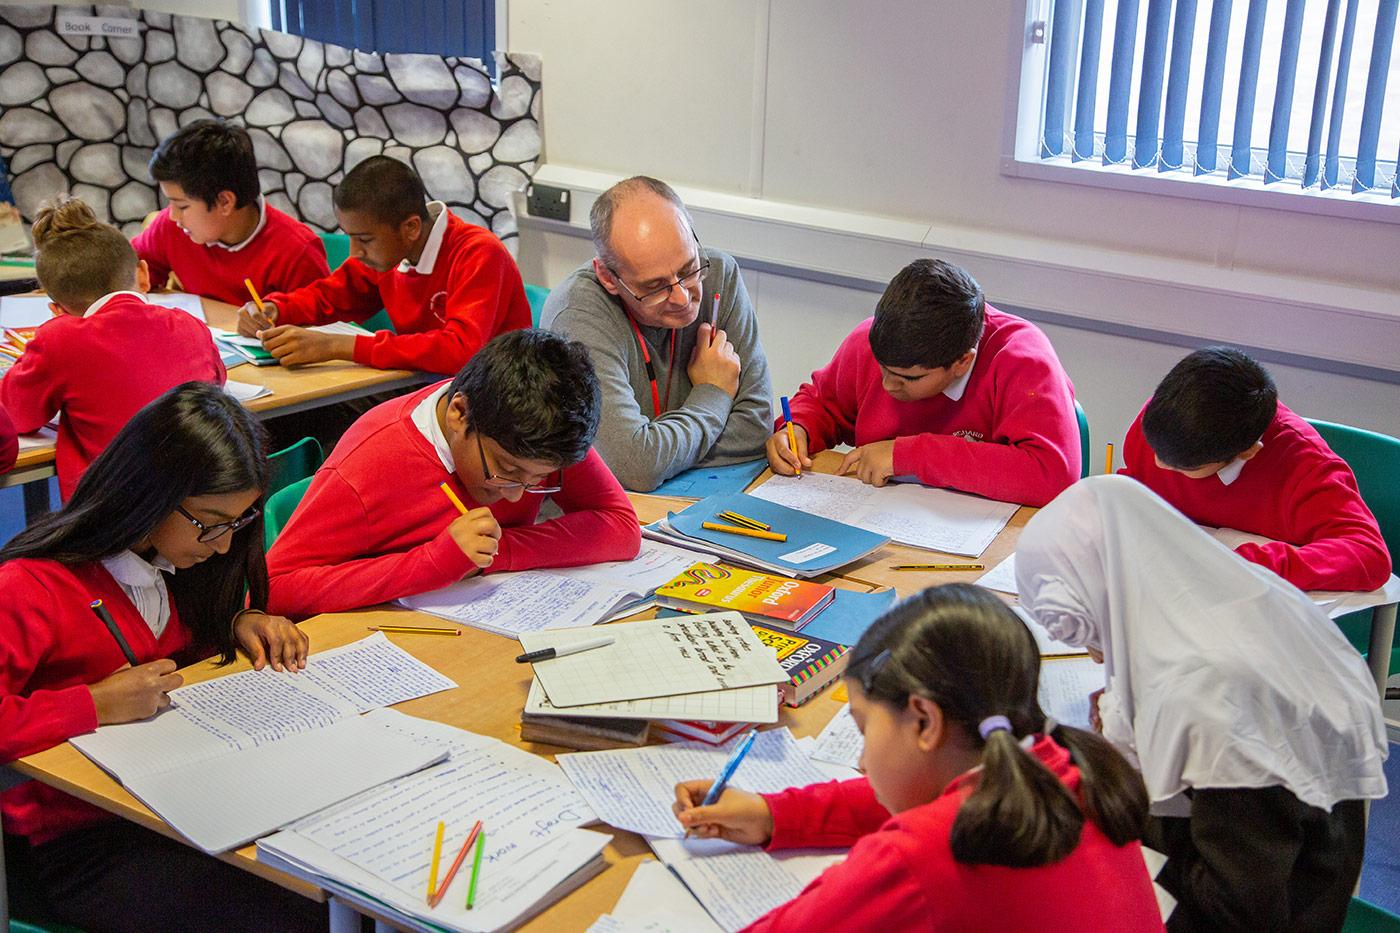 Curriculum Reception | Orchard Primary School Hounslow regarding Orchard School Calendar